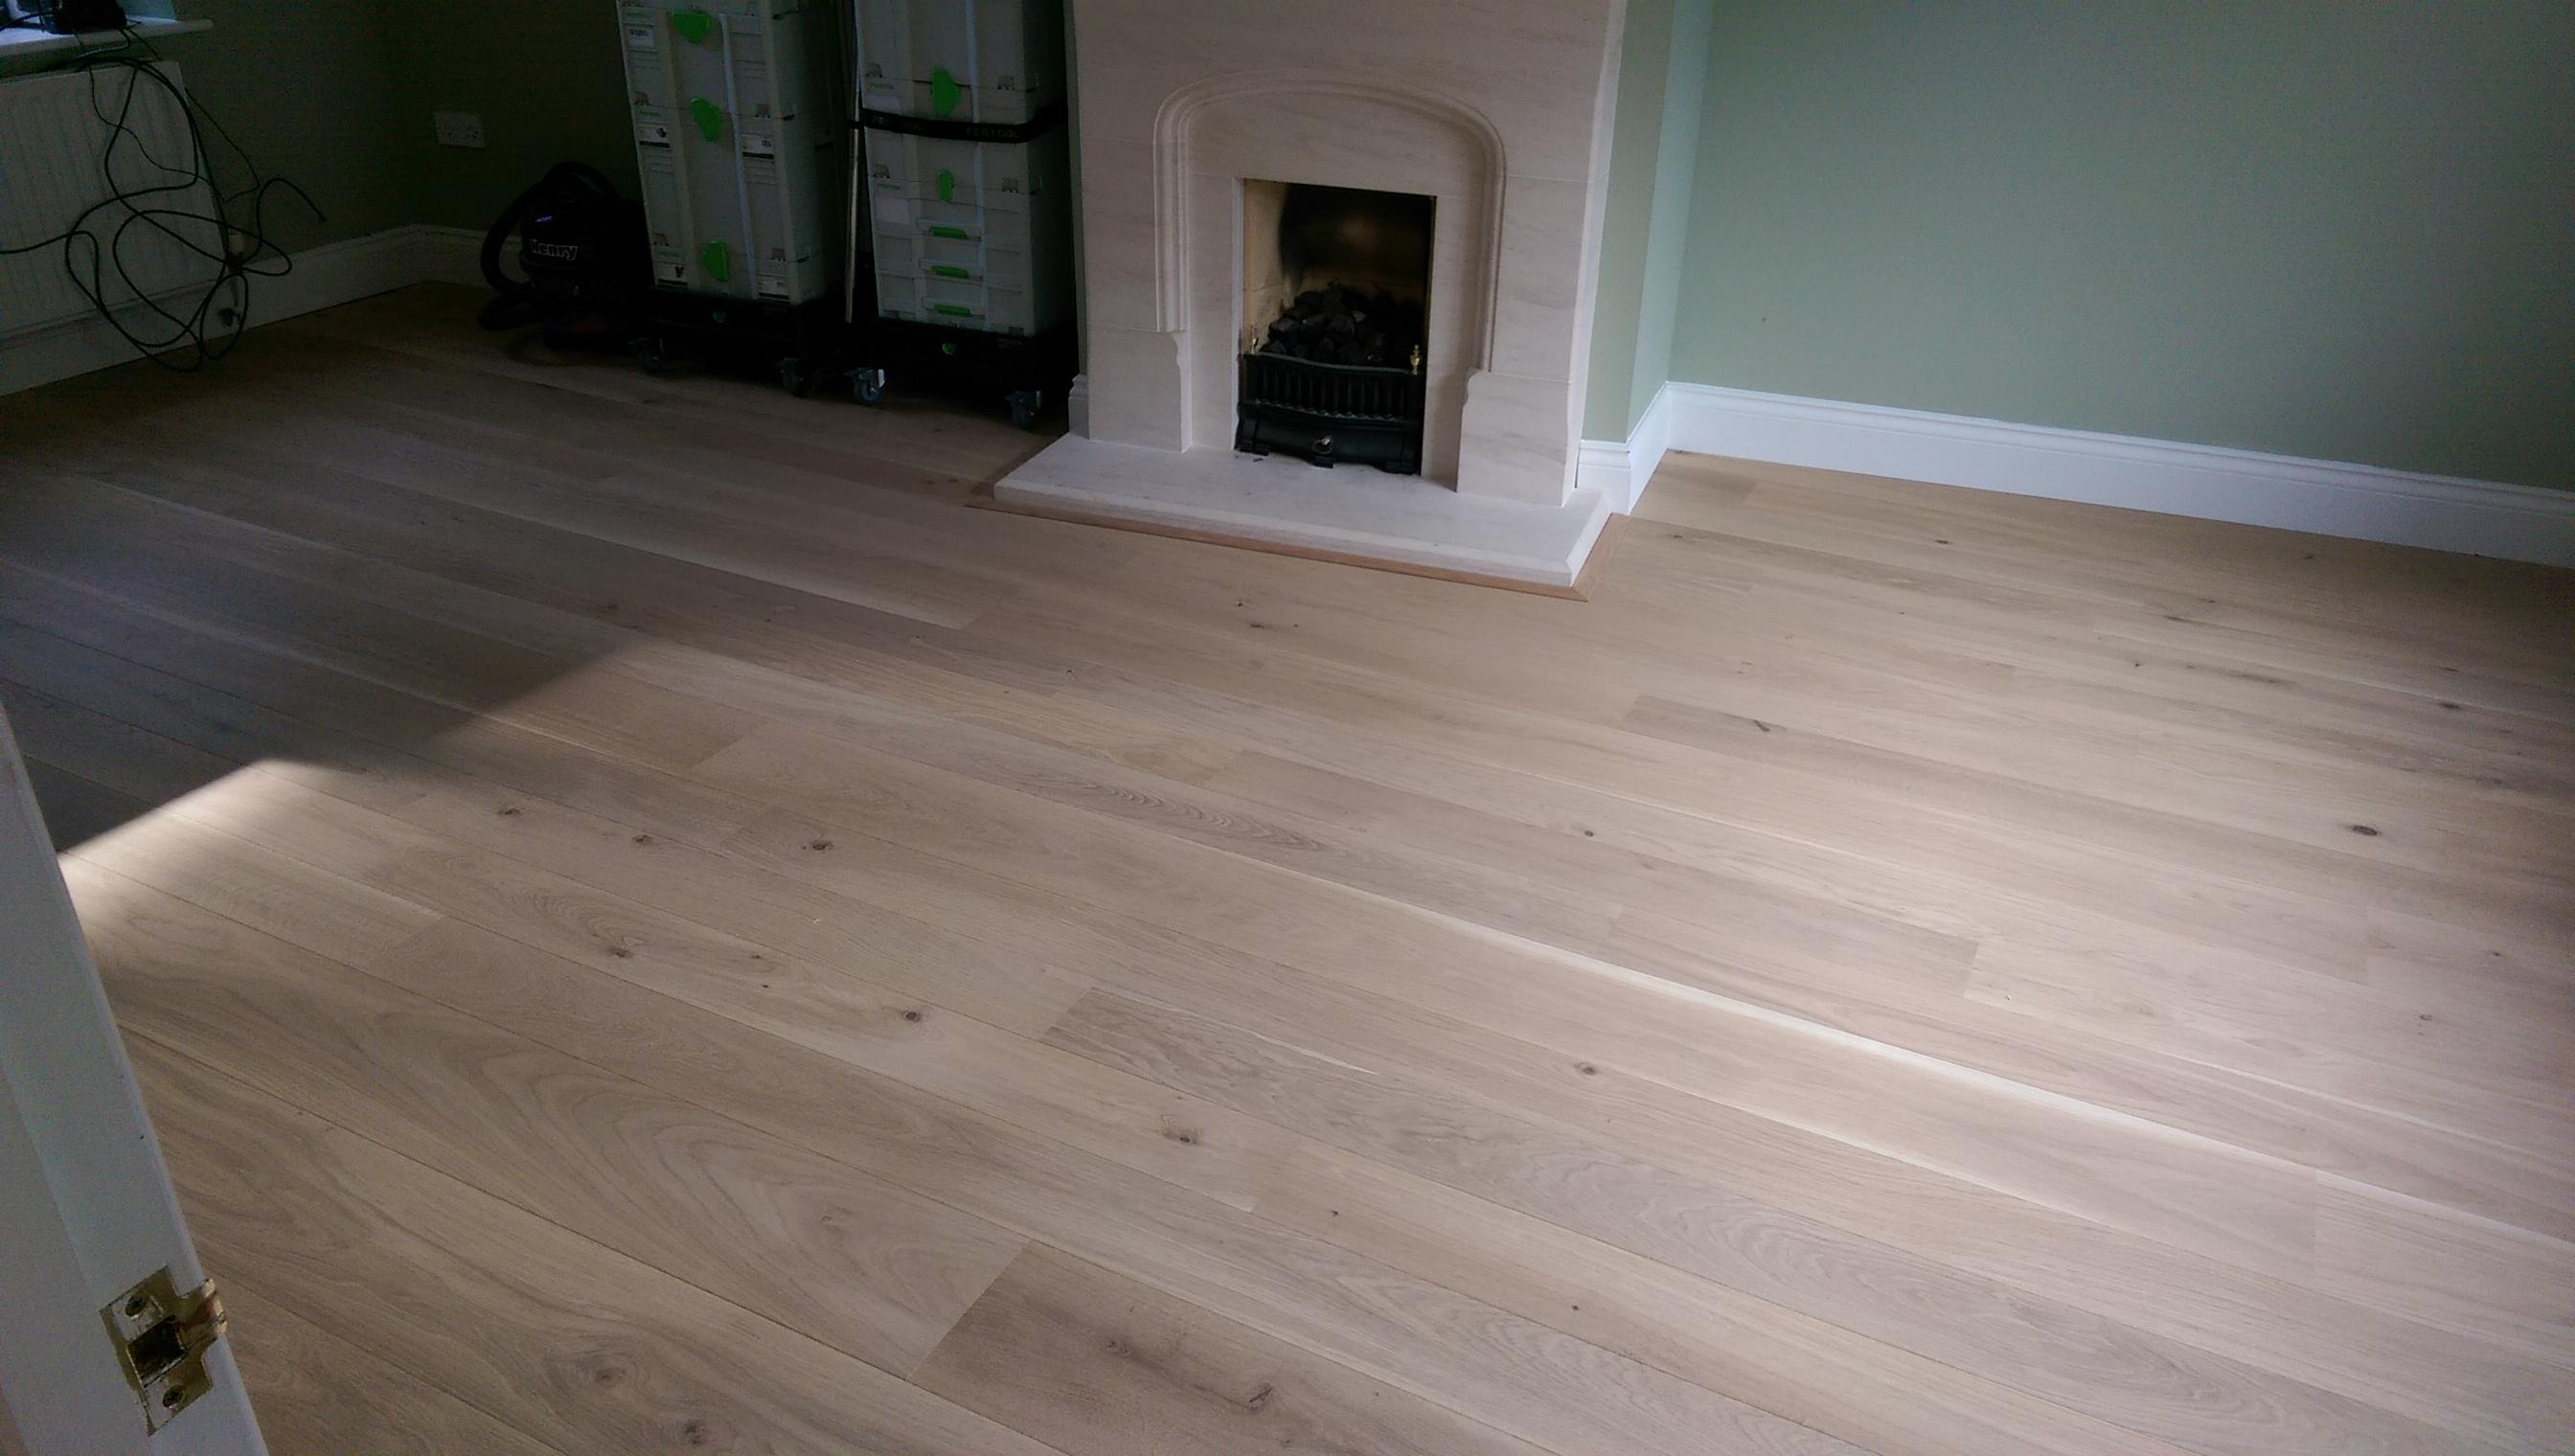 JJP Wood Flooring Company Installations Portfolio - Who installs hardwood floors